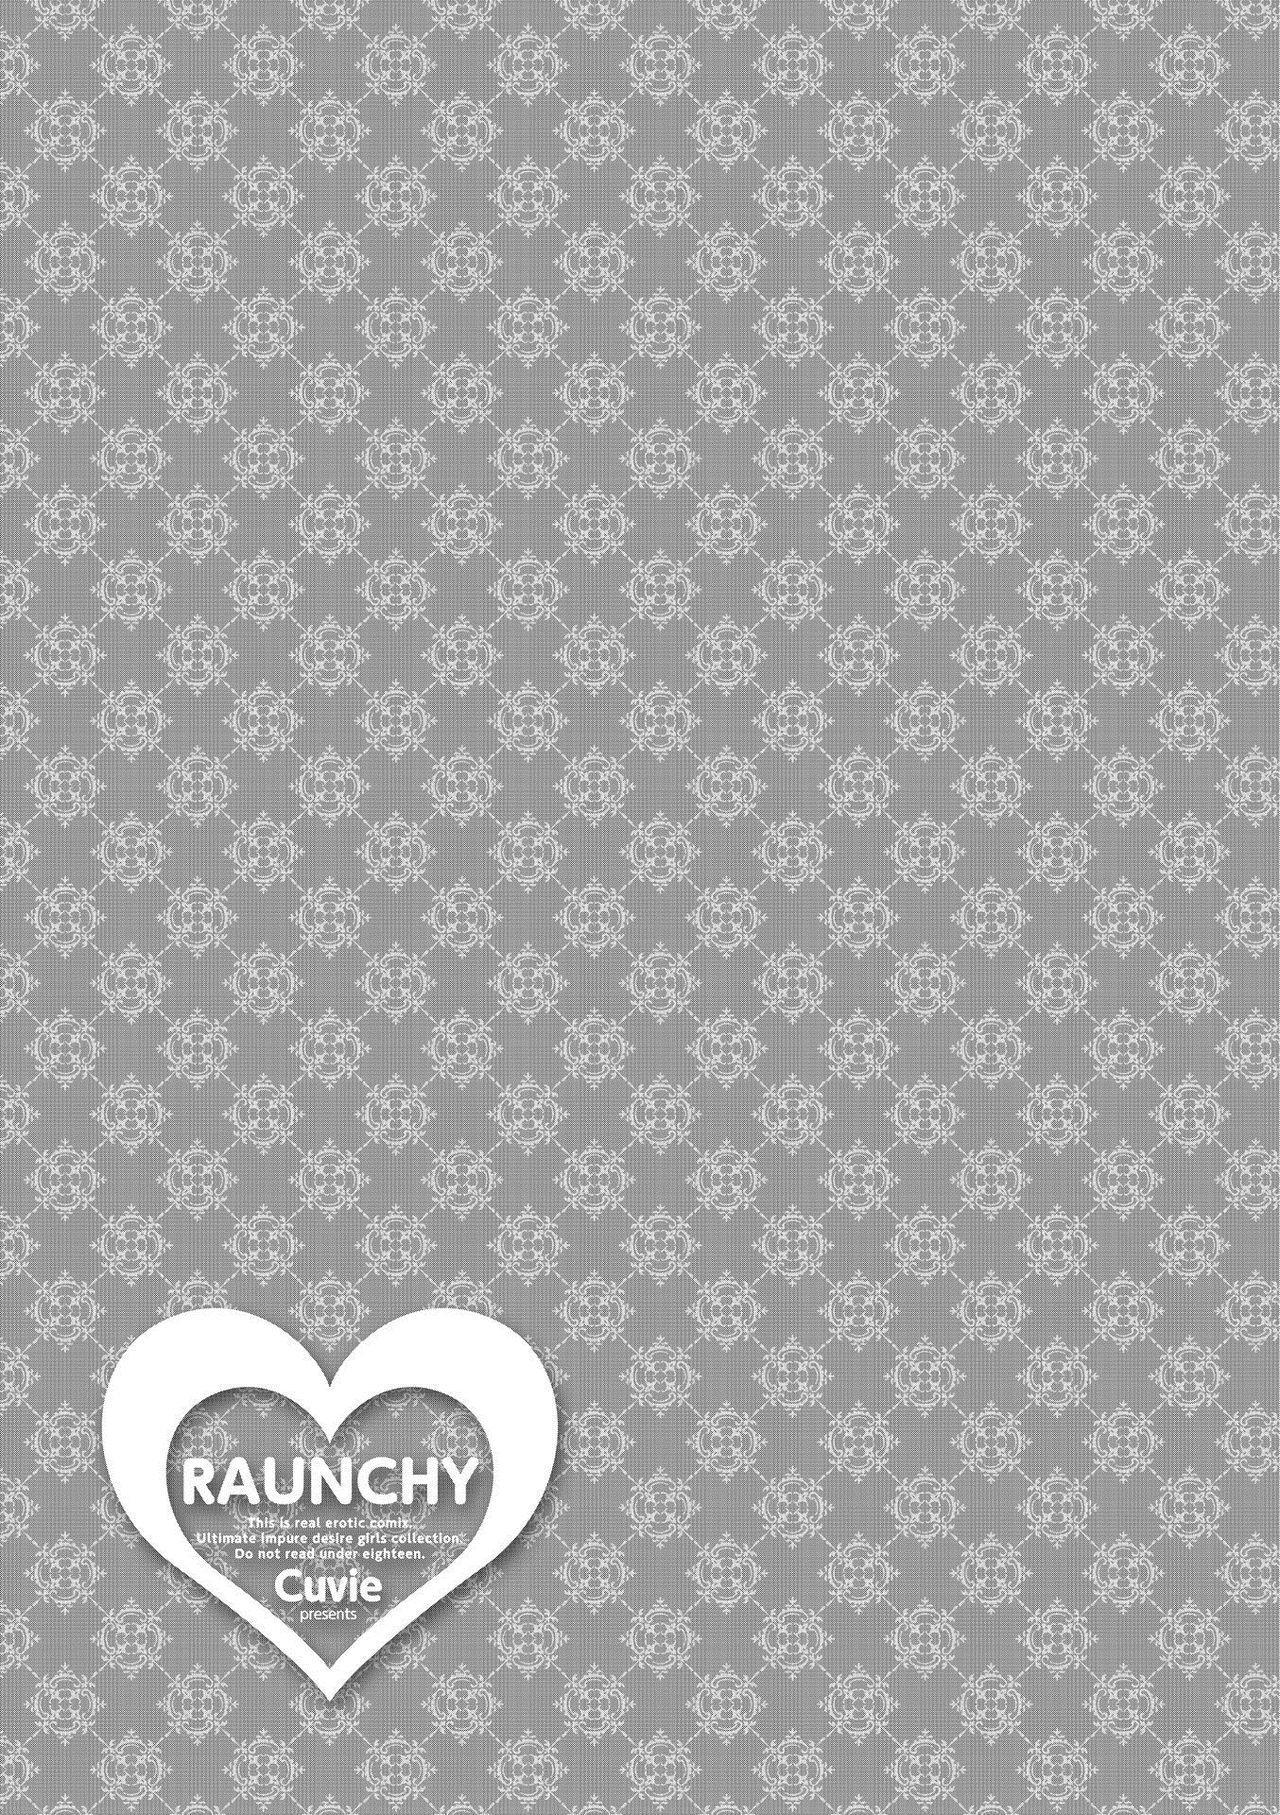 RAUNCHY 80